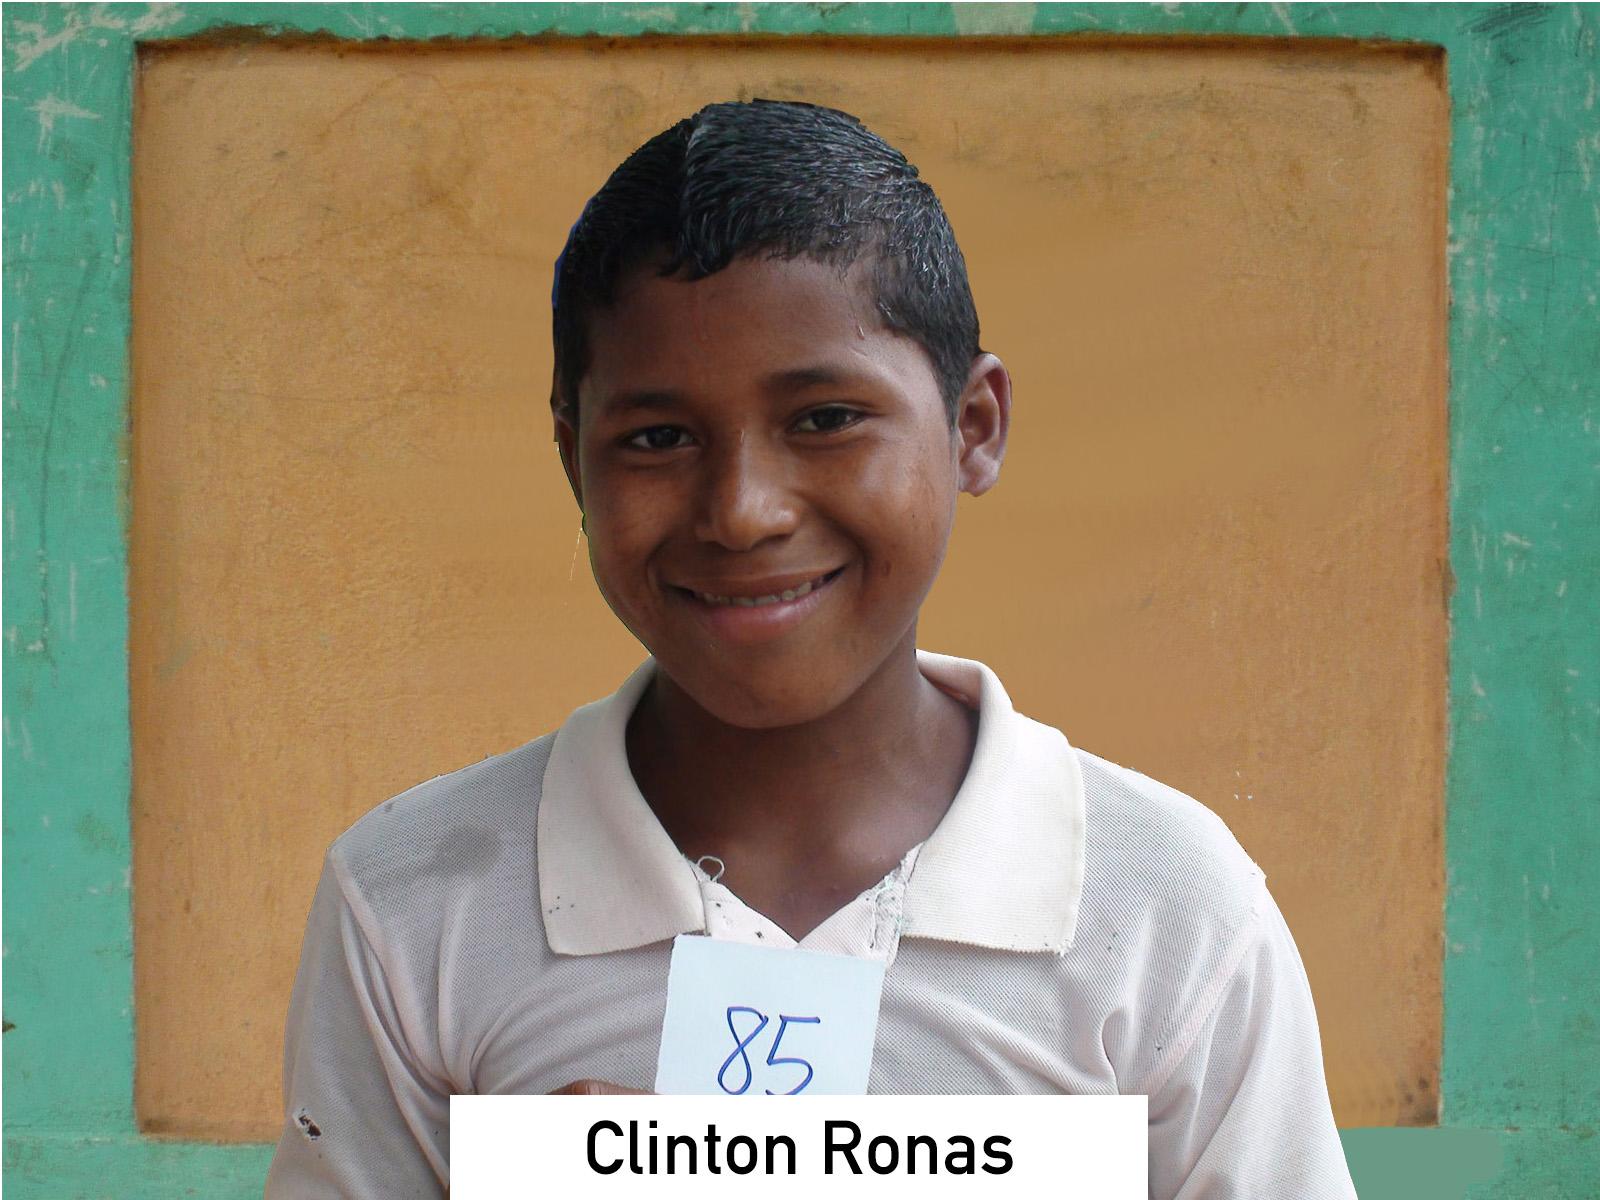 085 - Clinton Ronas.jpg